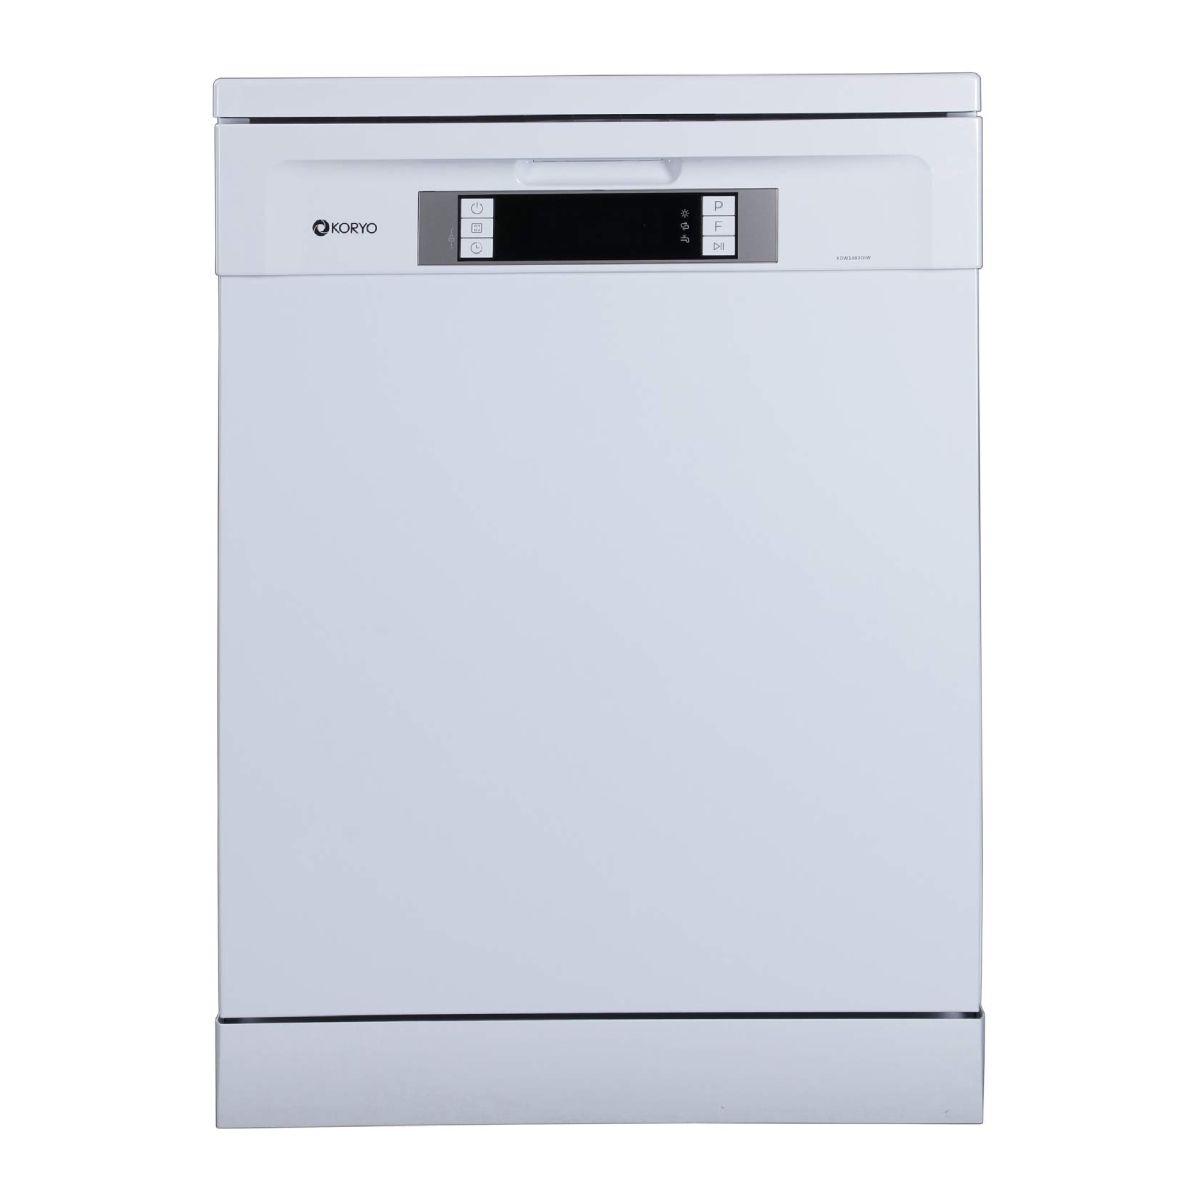 Koryo Dishwasher KDW1483DIW